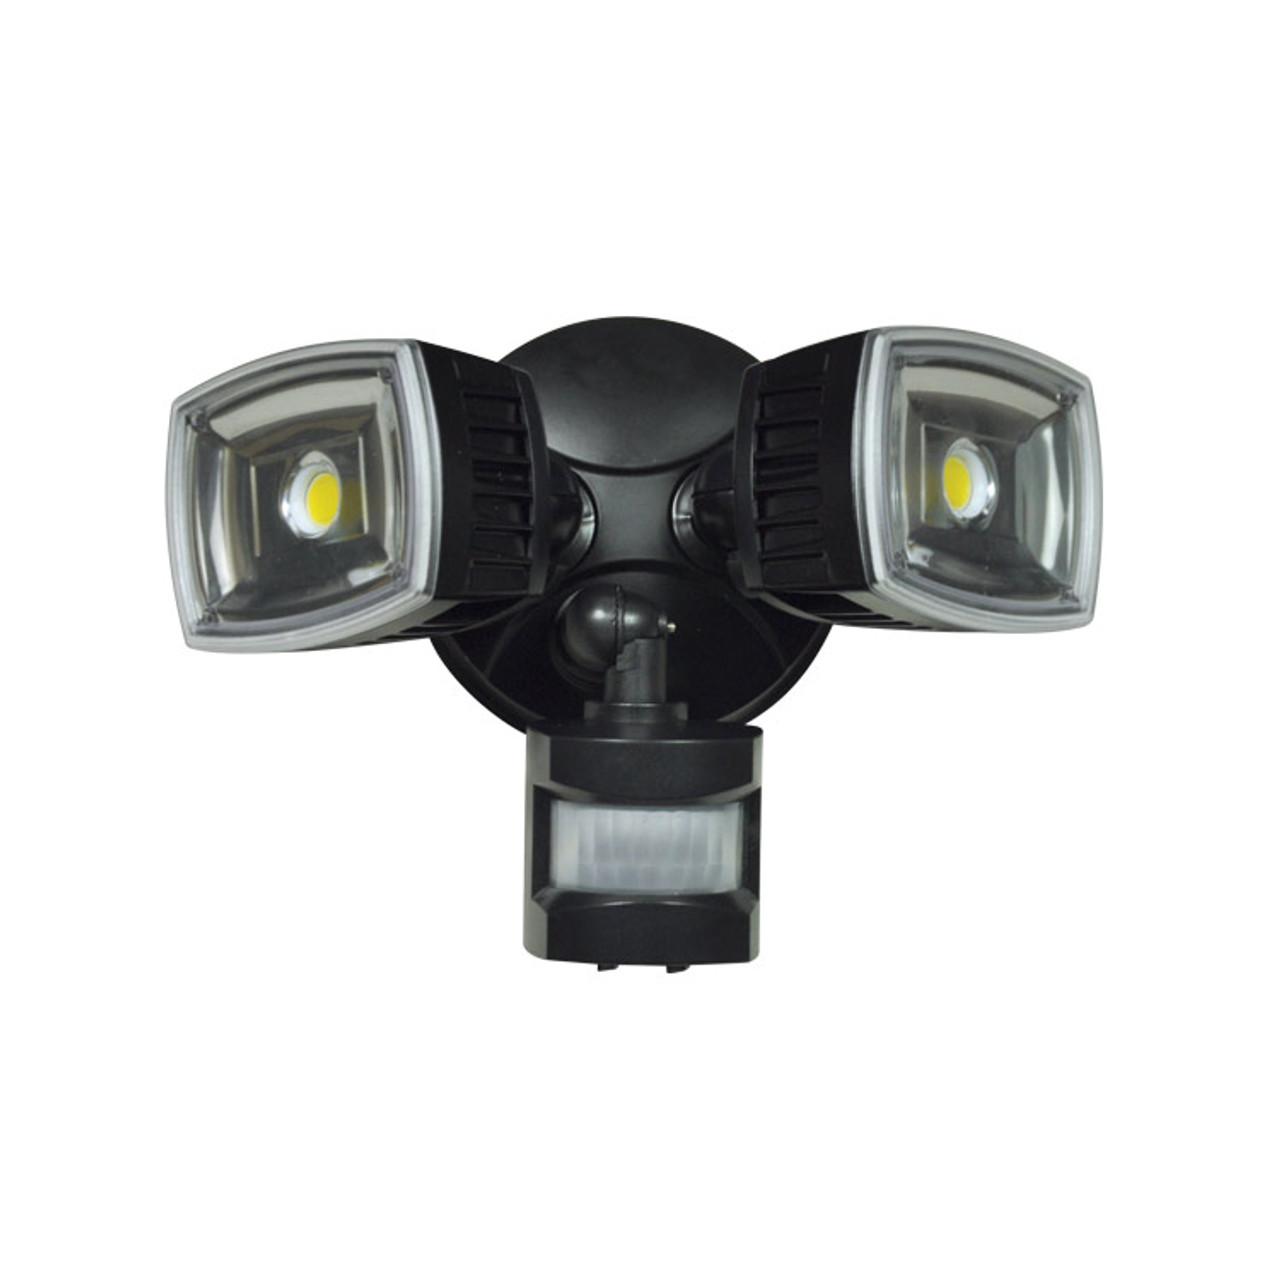 Rab Design Led Flood Lights: RAB DESIGN LED Twin Floodlight Motion Detector 28W